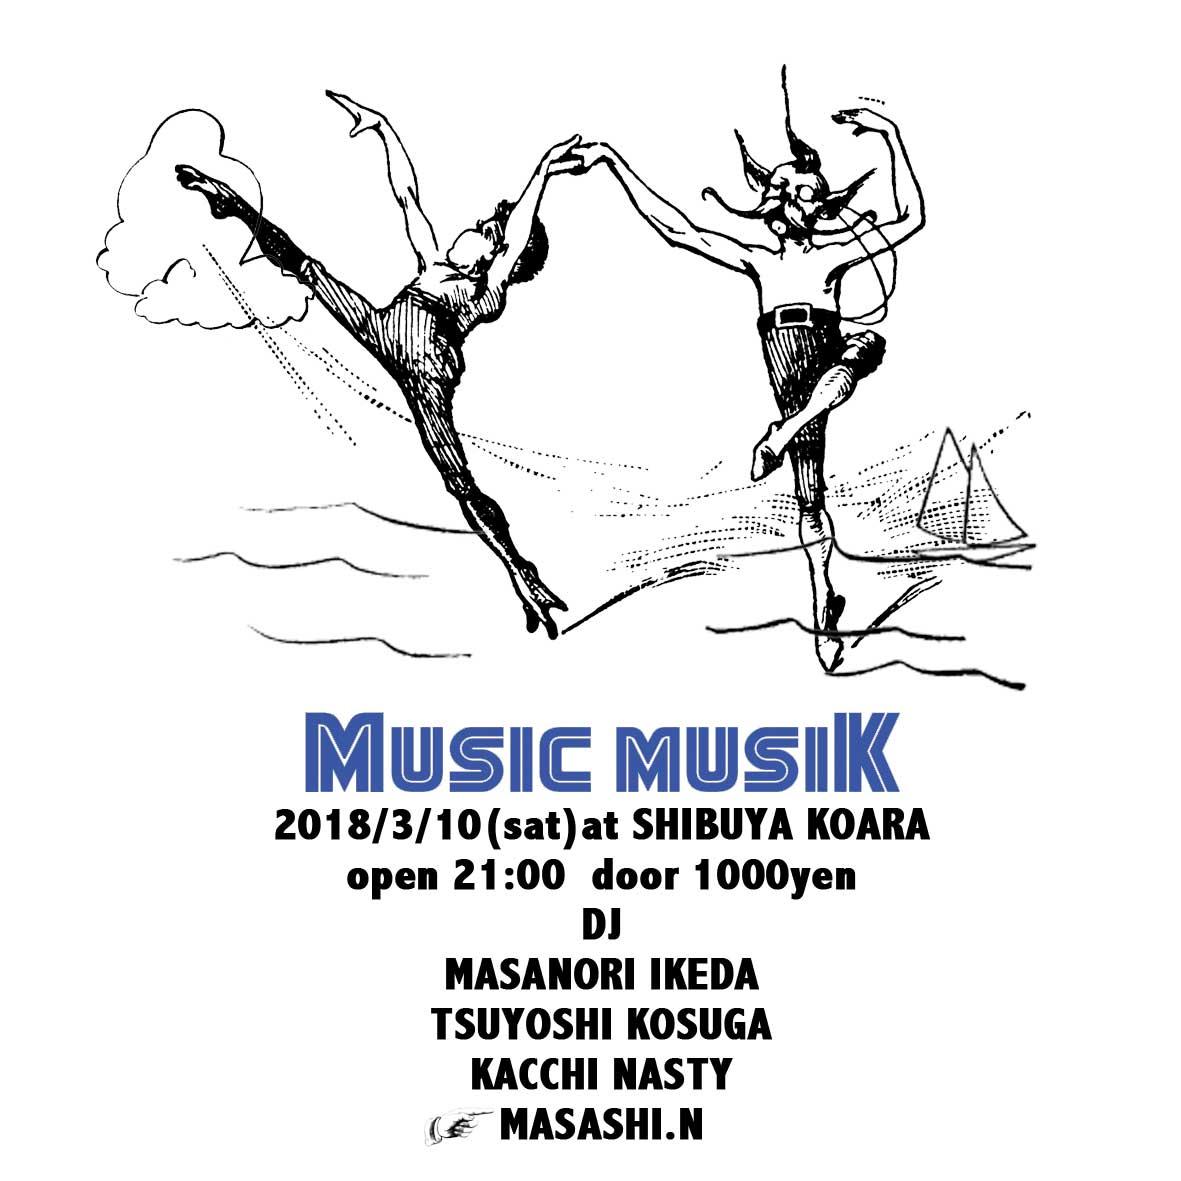 Music musiK